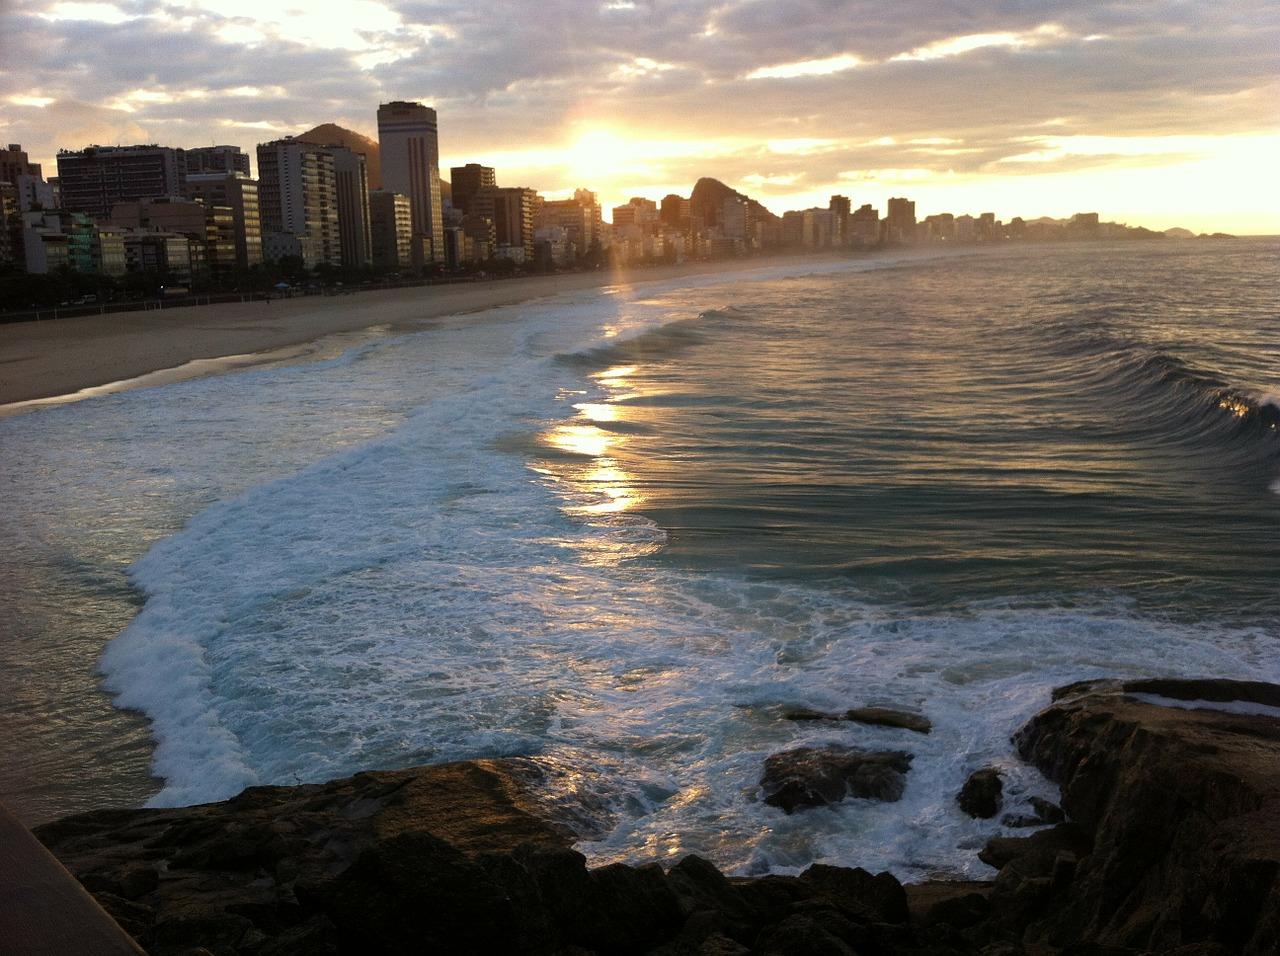 Copacabana Beach in Brazil